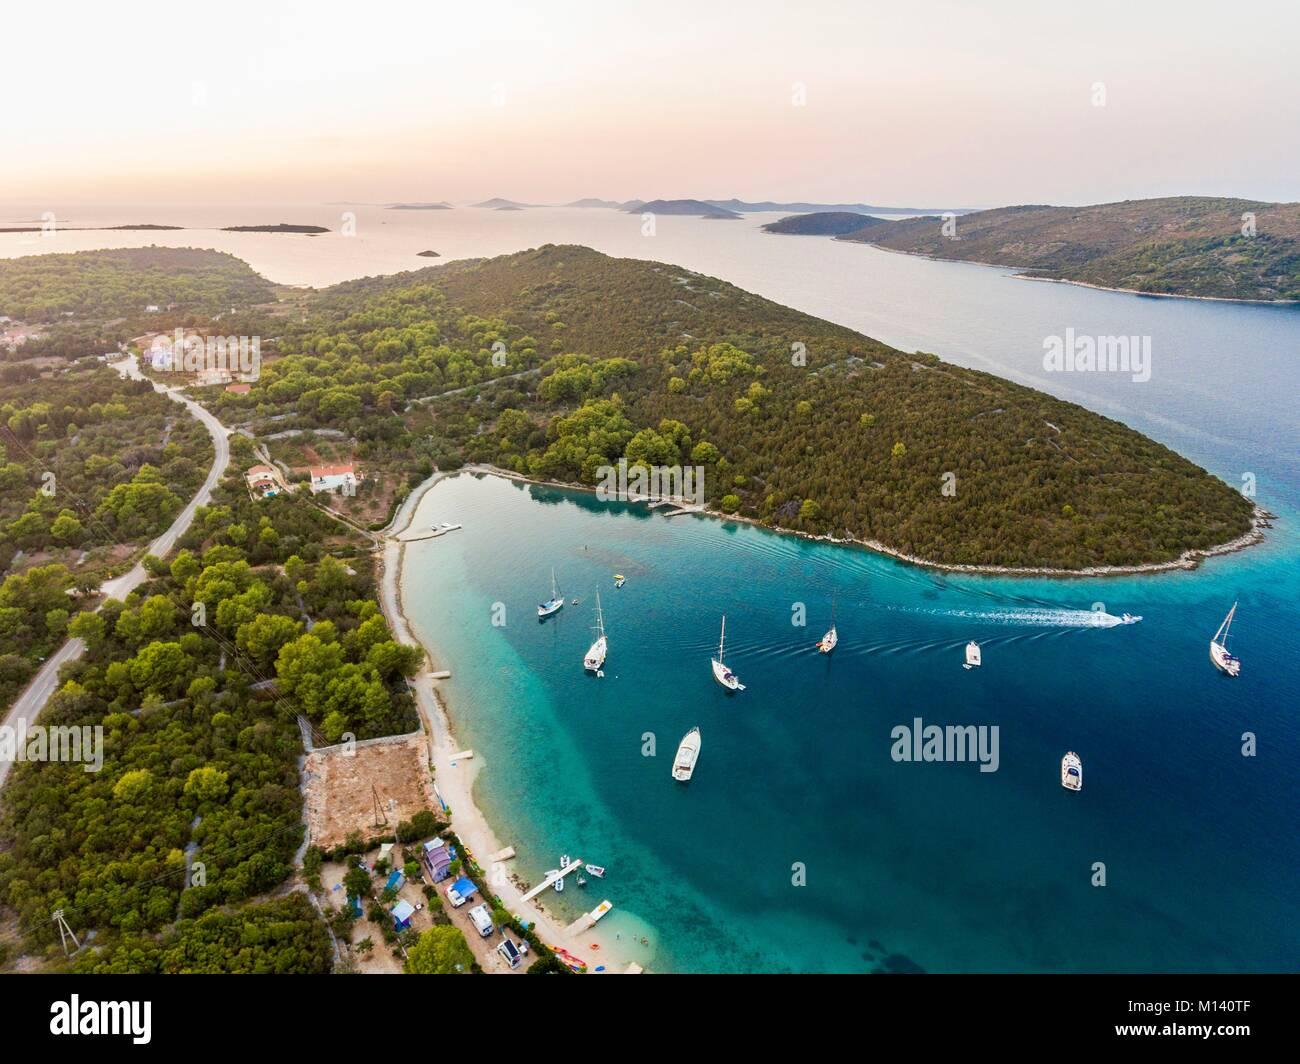 Croacia, Dalmacia del Norte, la costa dálmata, archipiélago de Zadar, Dugi Otok, Campings Verunic (vista aérea) Foto de stock